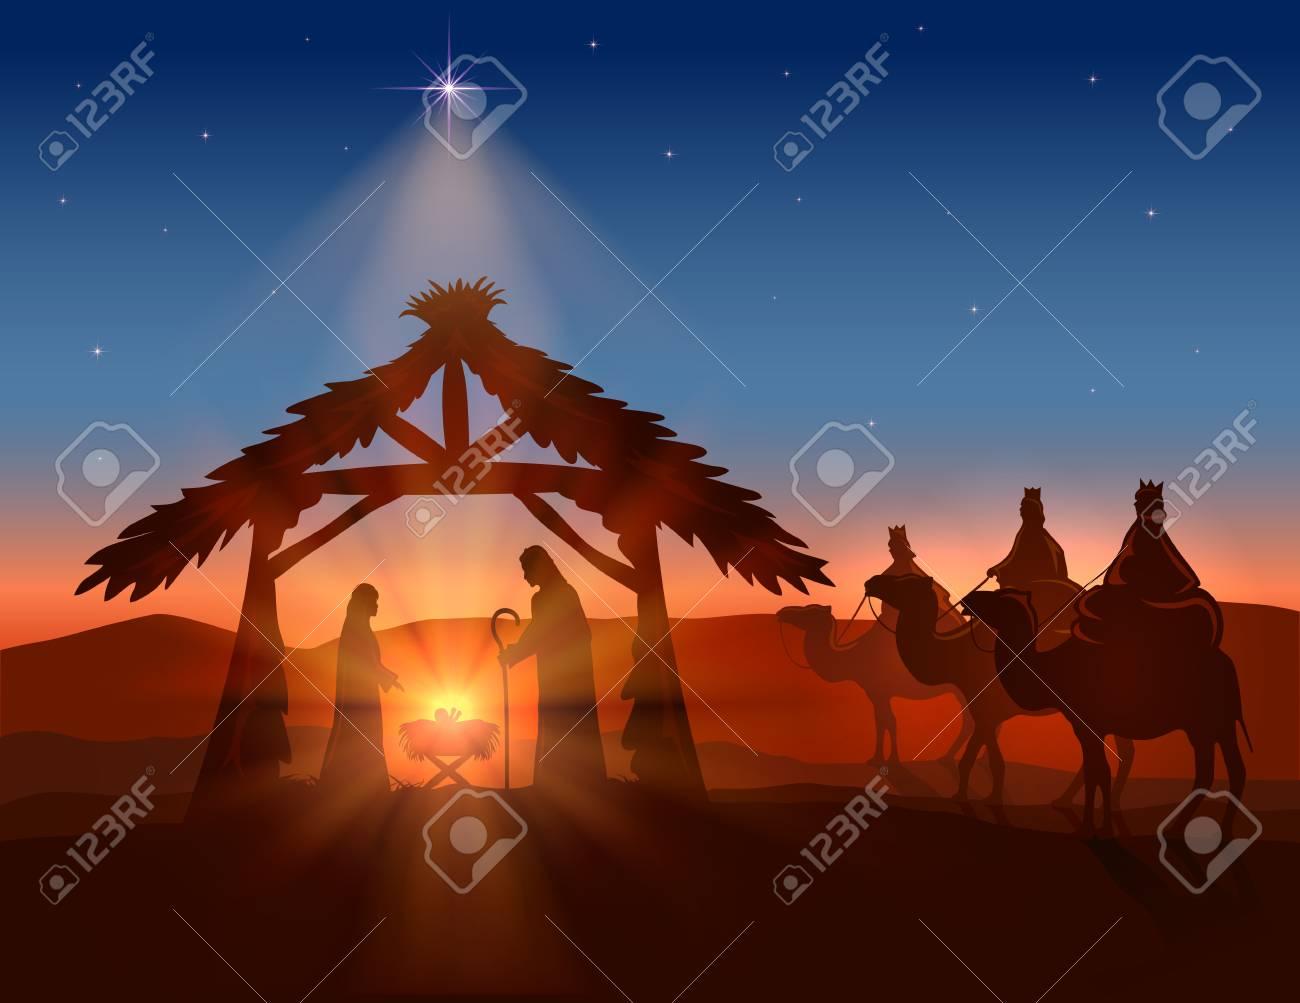 Christmas Background Christian.Christian Christmas Background Birth Of Jesus Shining Star